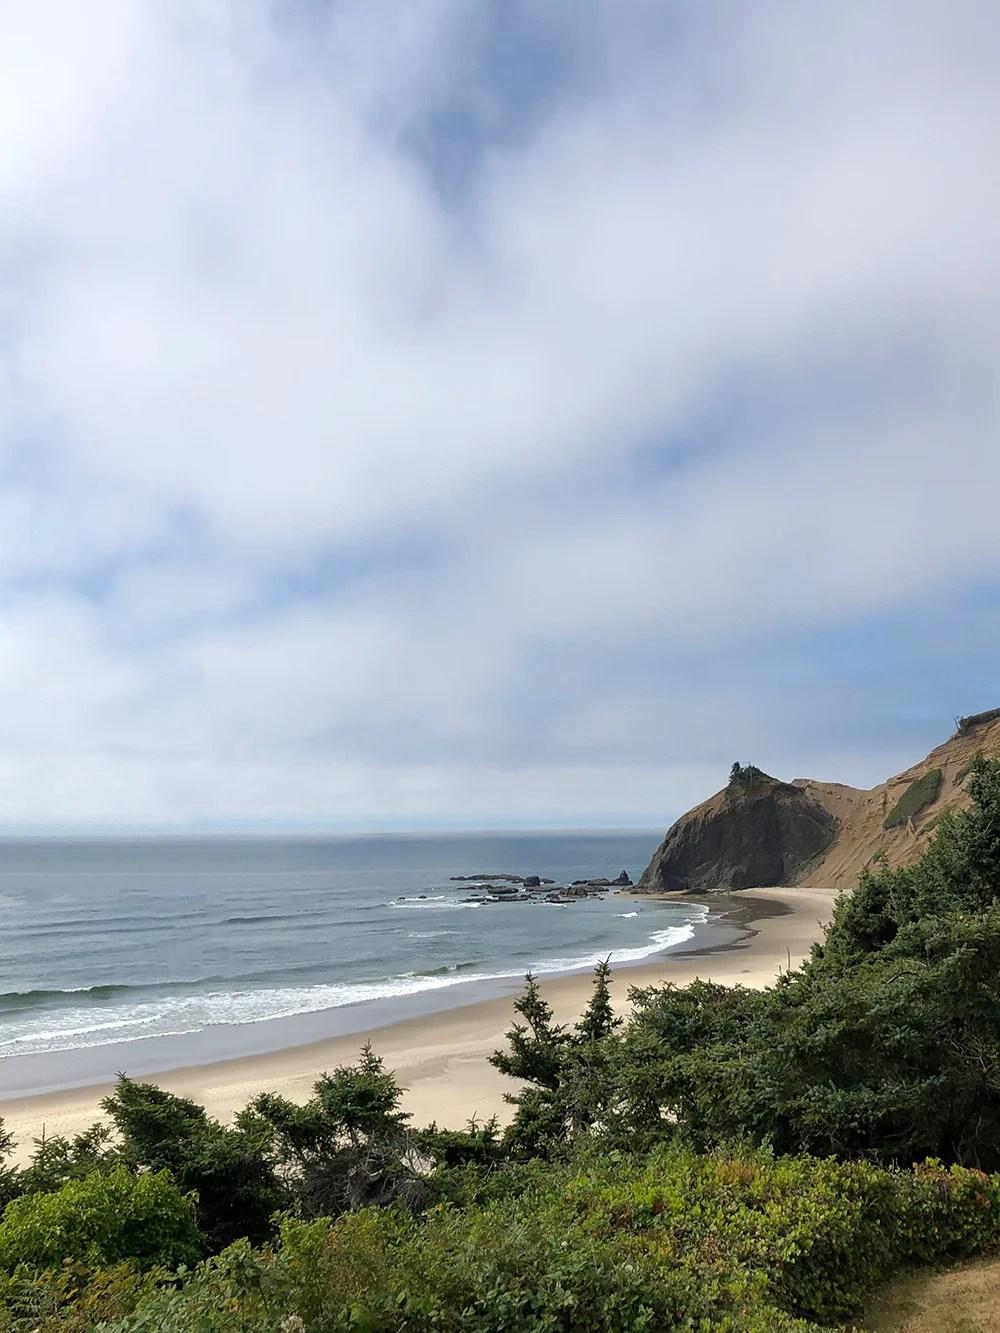 Vacation Scenes : Oregon - roomfortuesday.com